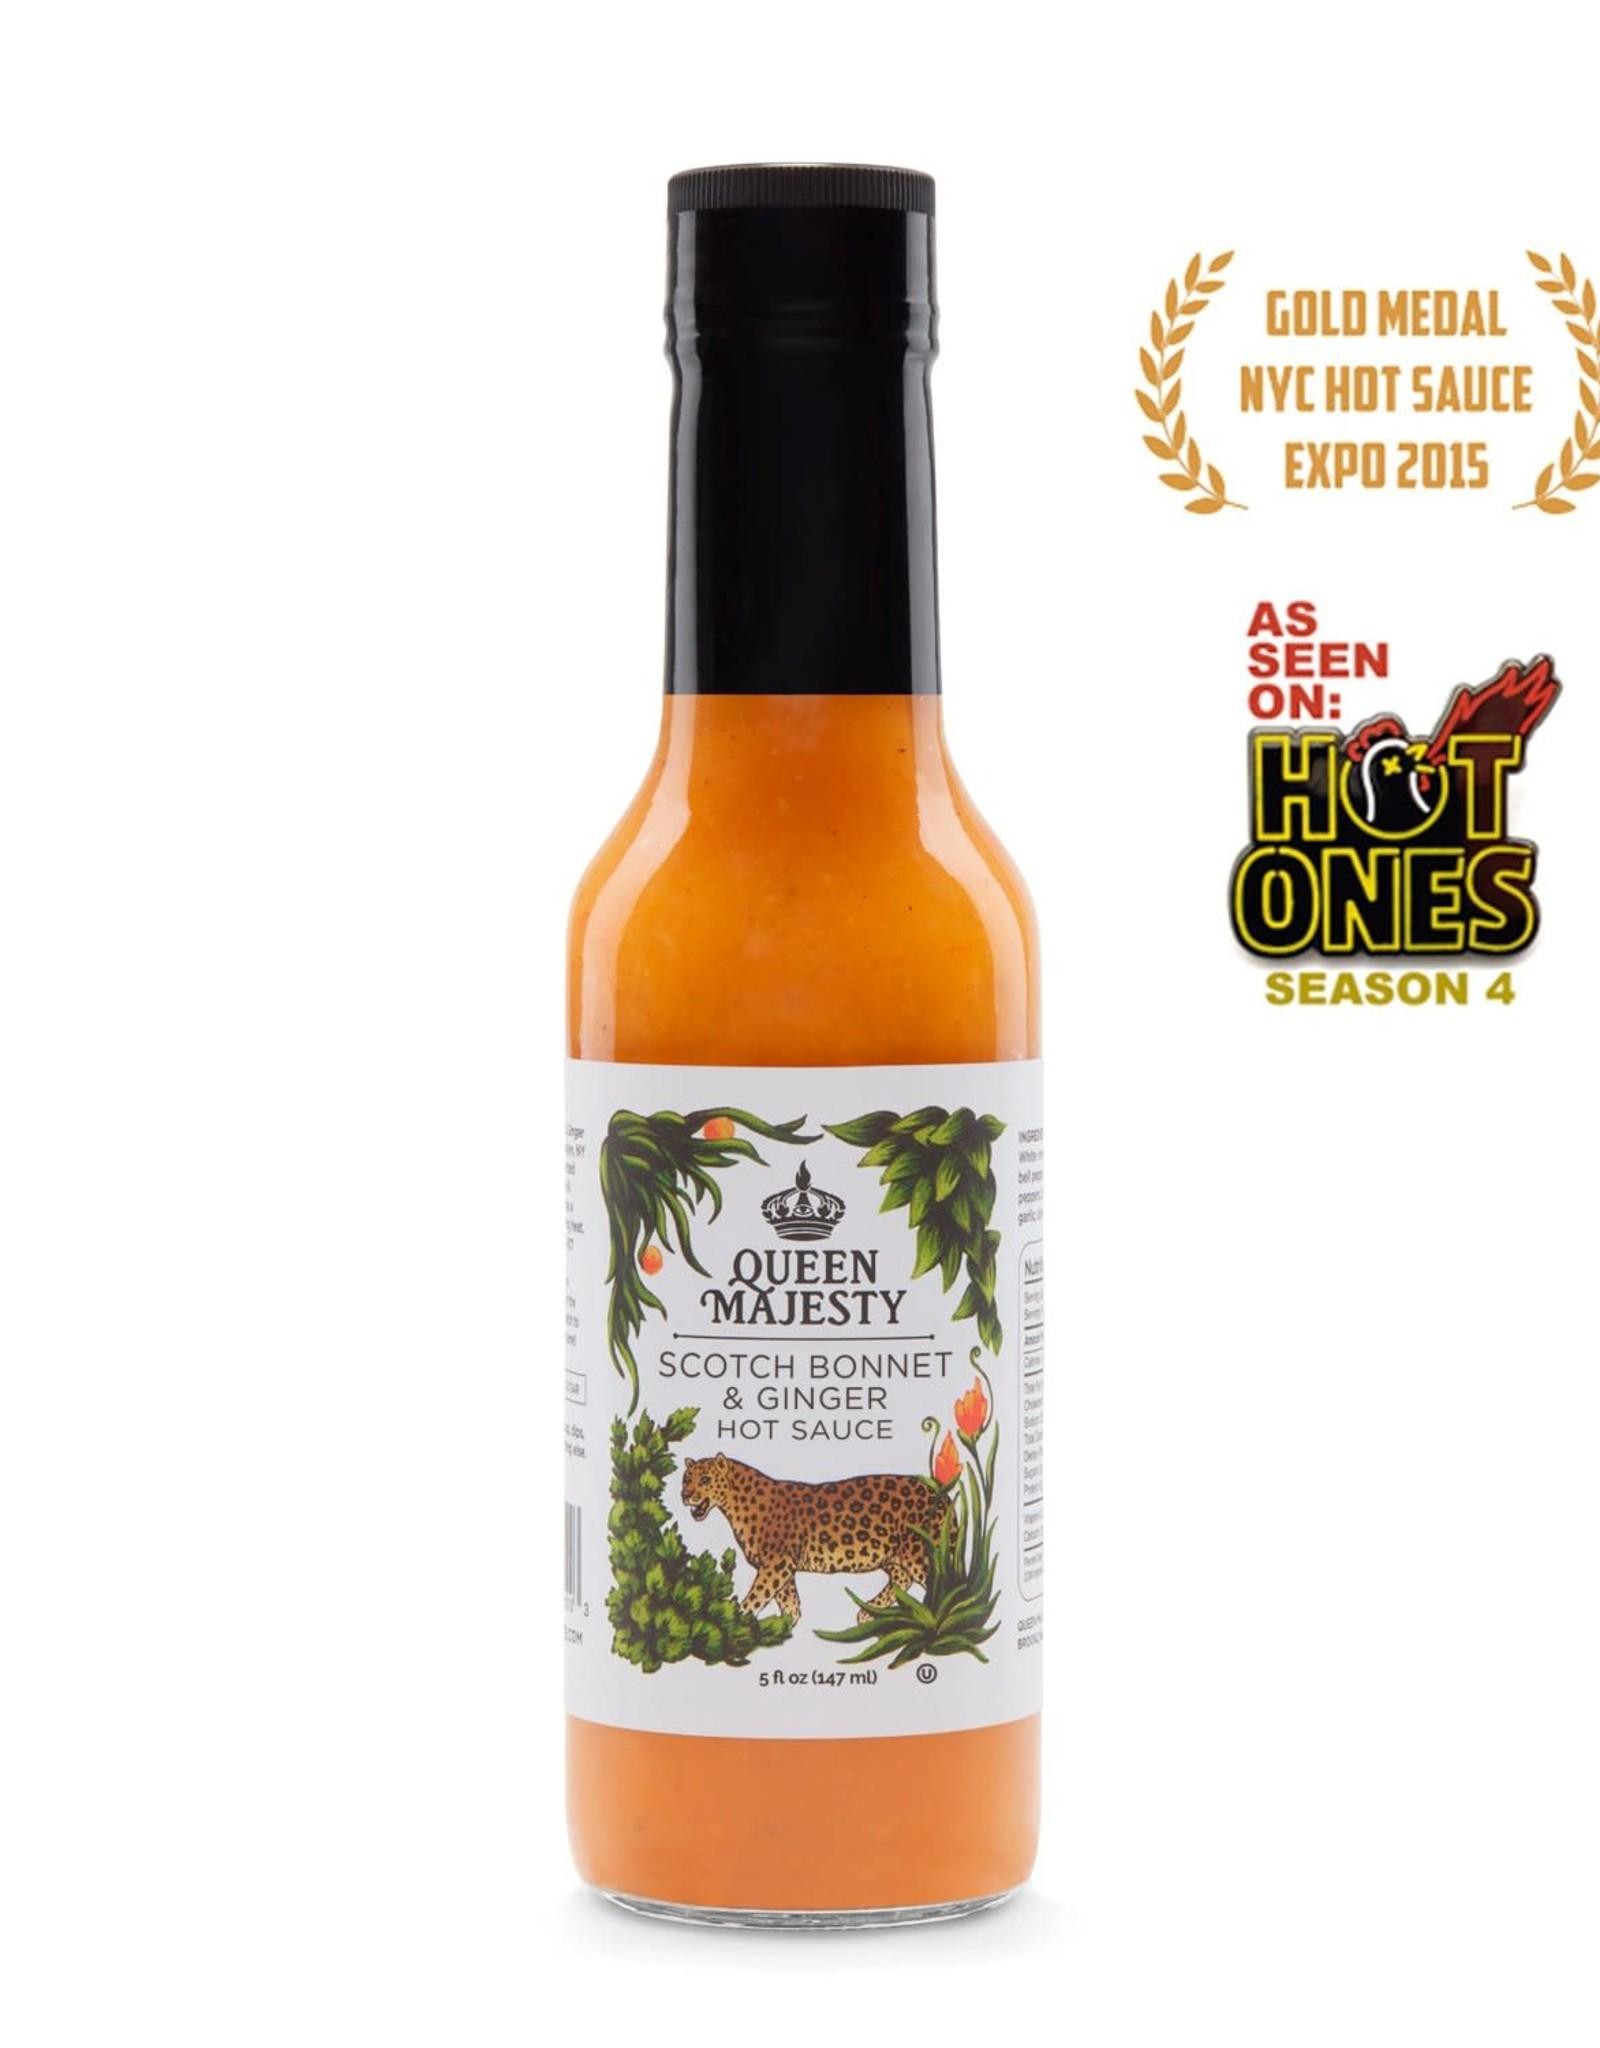 Queen's Majesty Queen's Majesty | Hot Sauce 5oz.